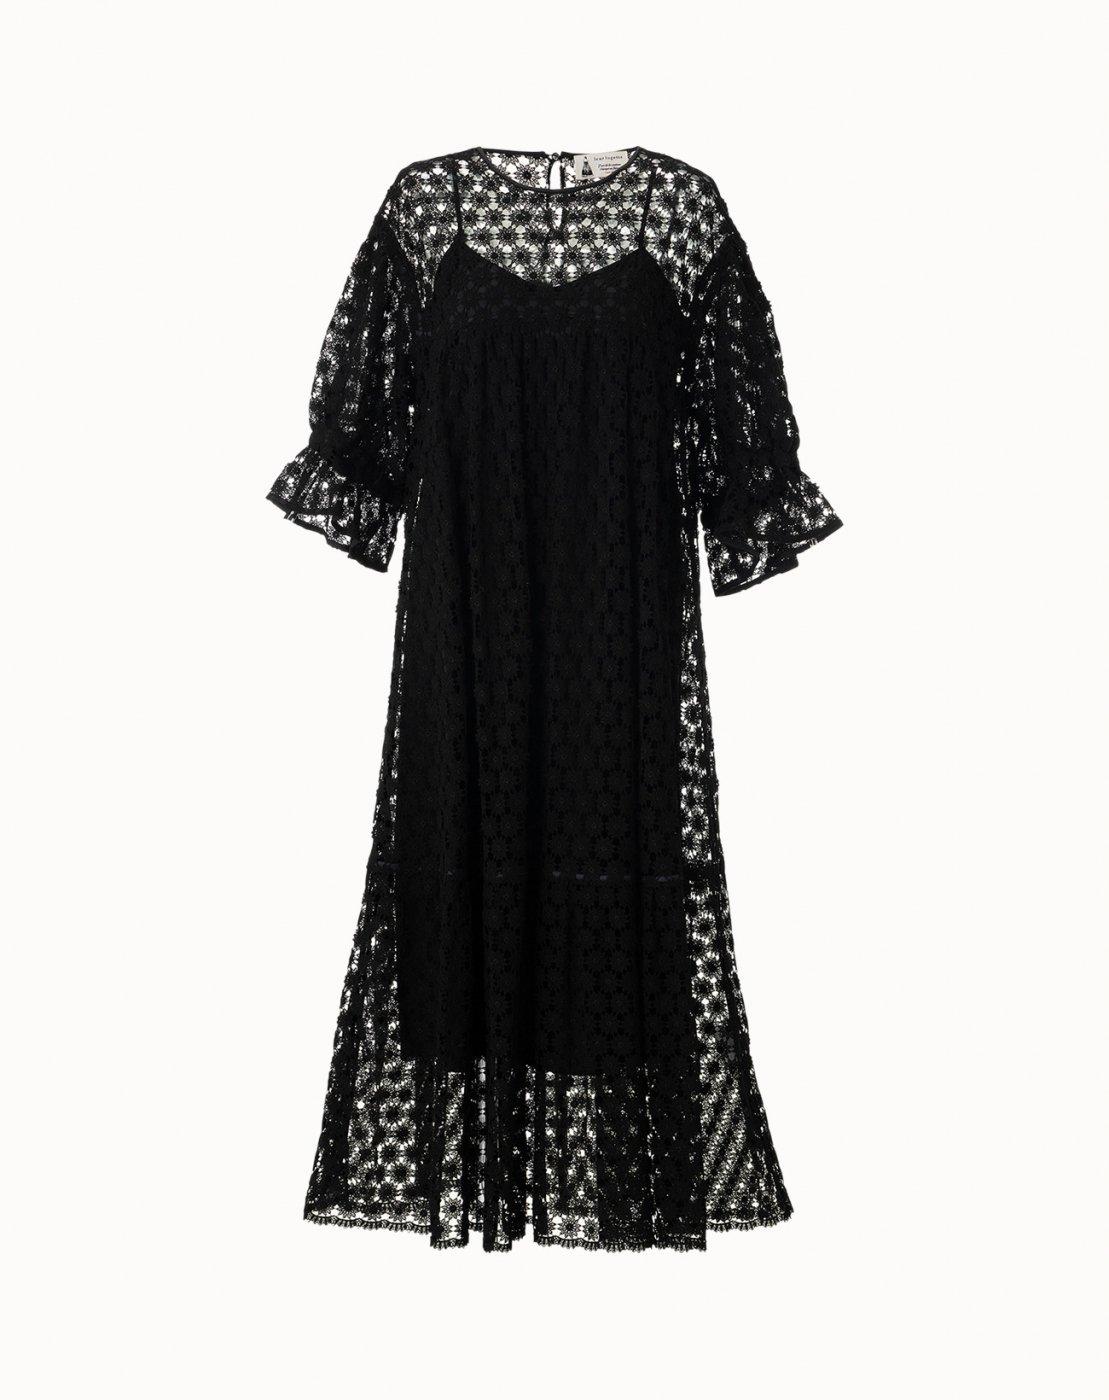 leur logette - Embroidery Dress - Black